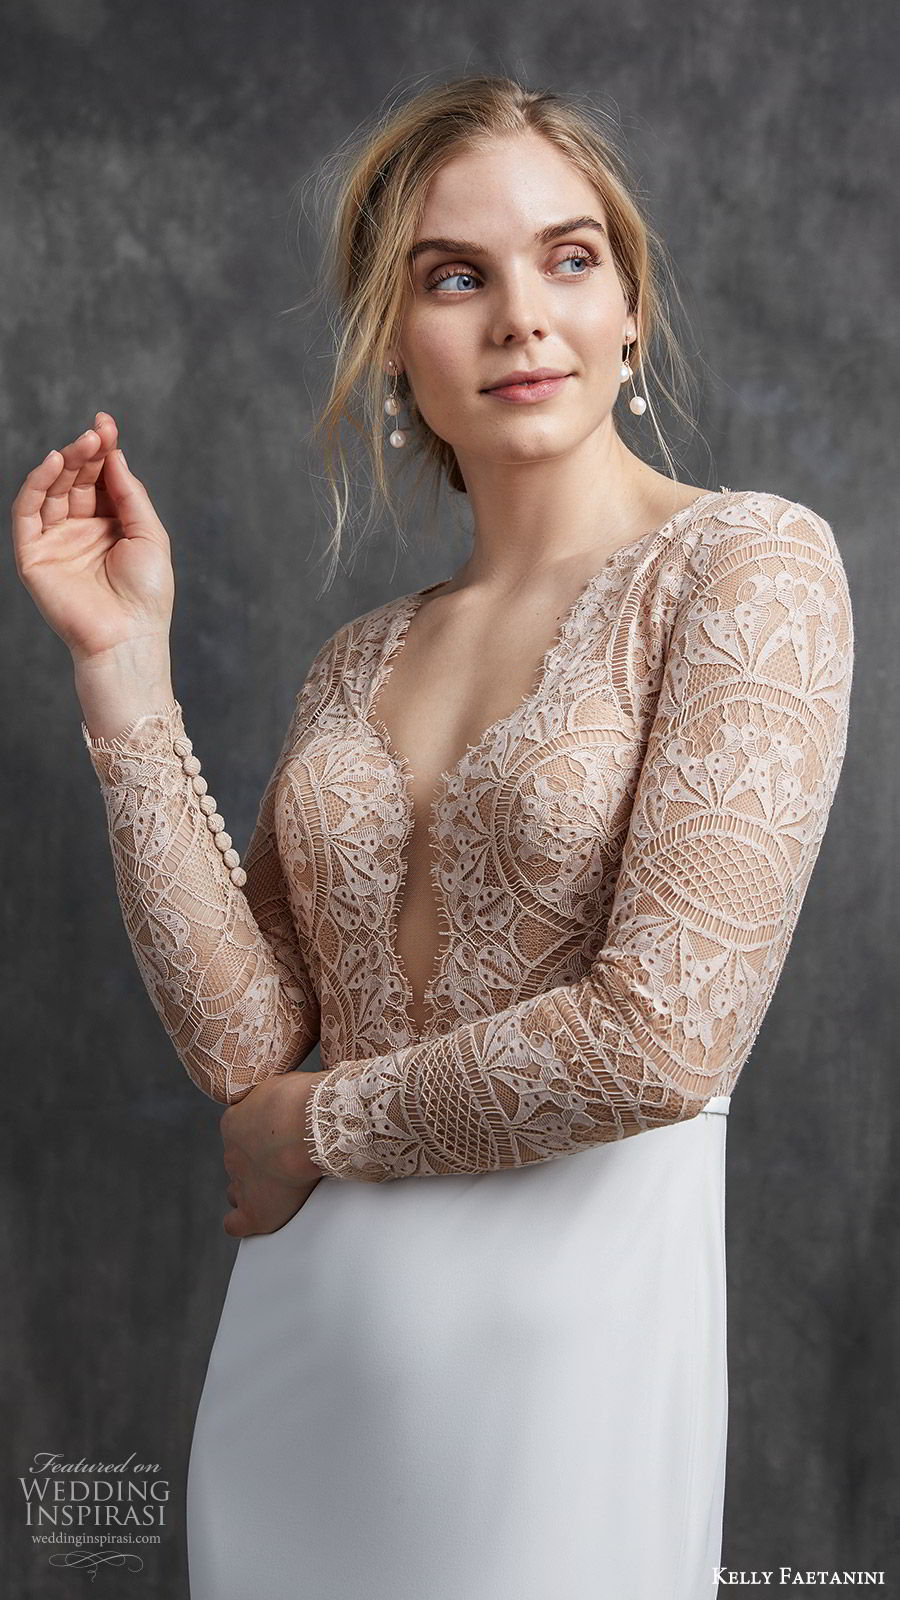 kelly faetanini spring 2020 bridal illusion long sleeves v neckline lace bodice fit flare modified a line mermaid wedding dress (2) chapel train elegant nude color keyhole back zv